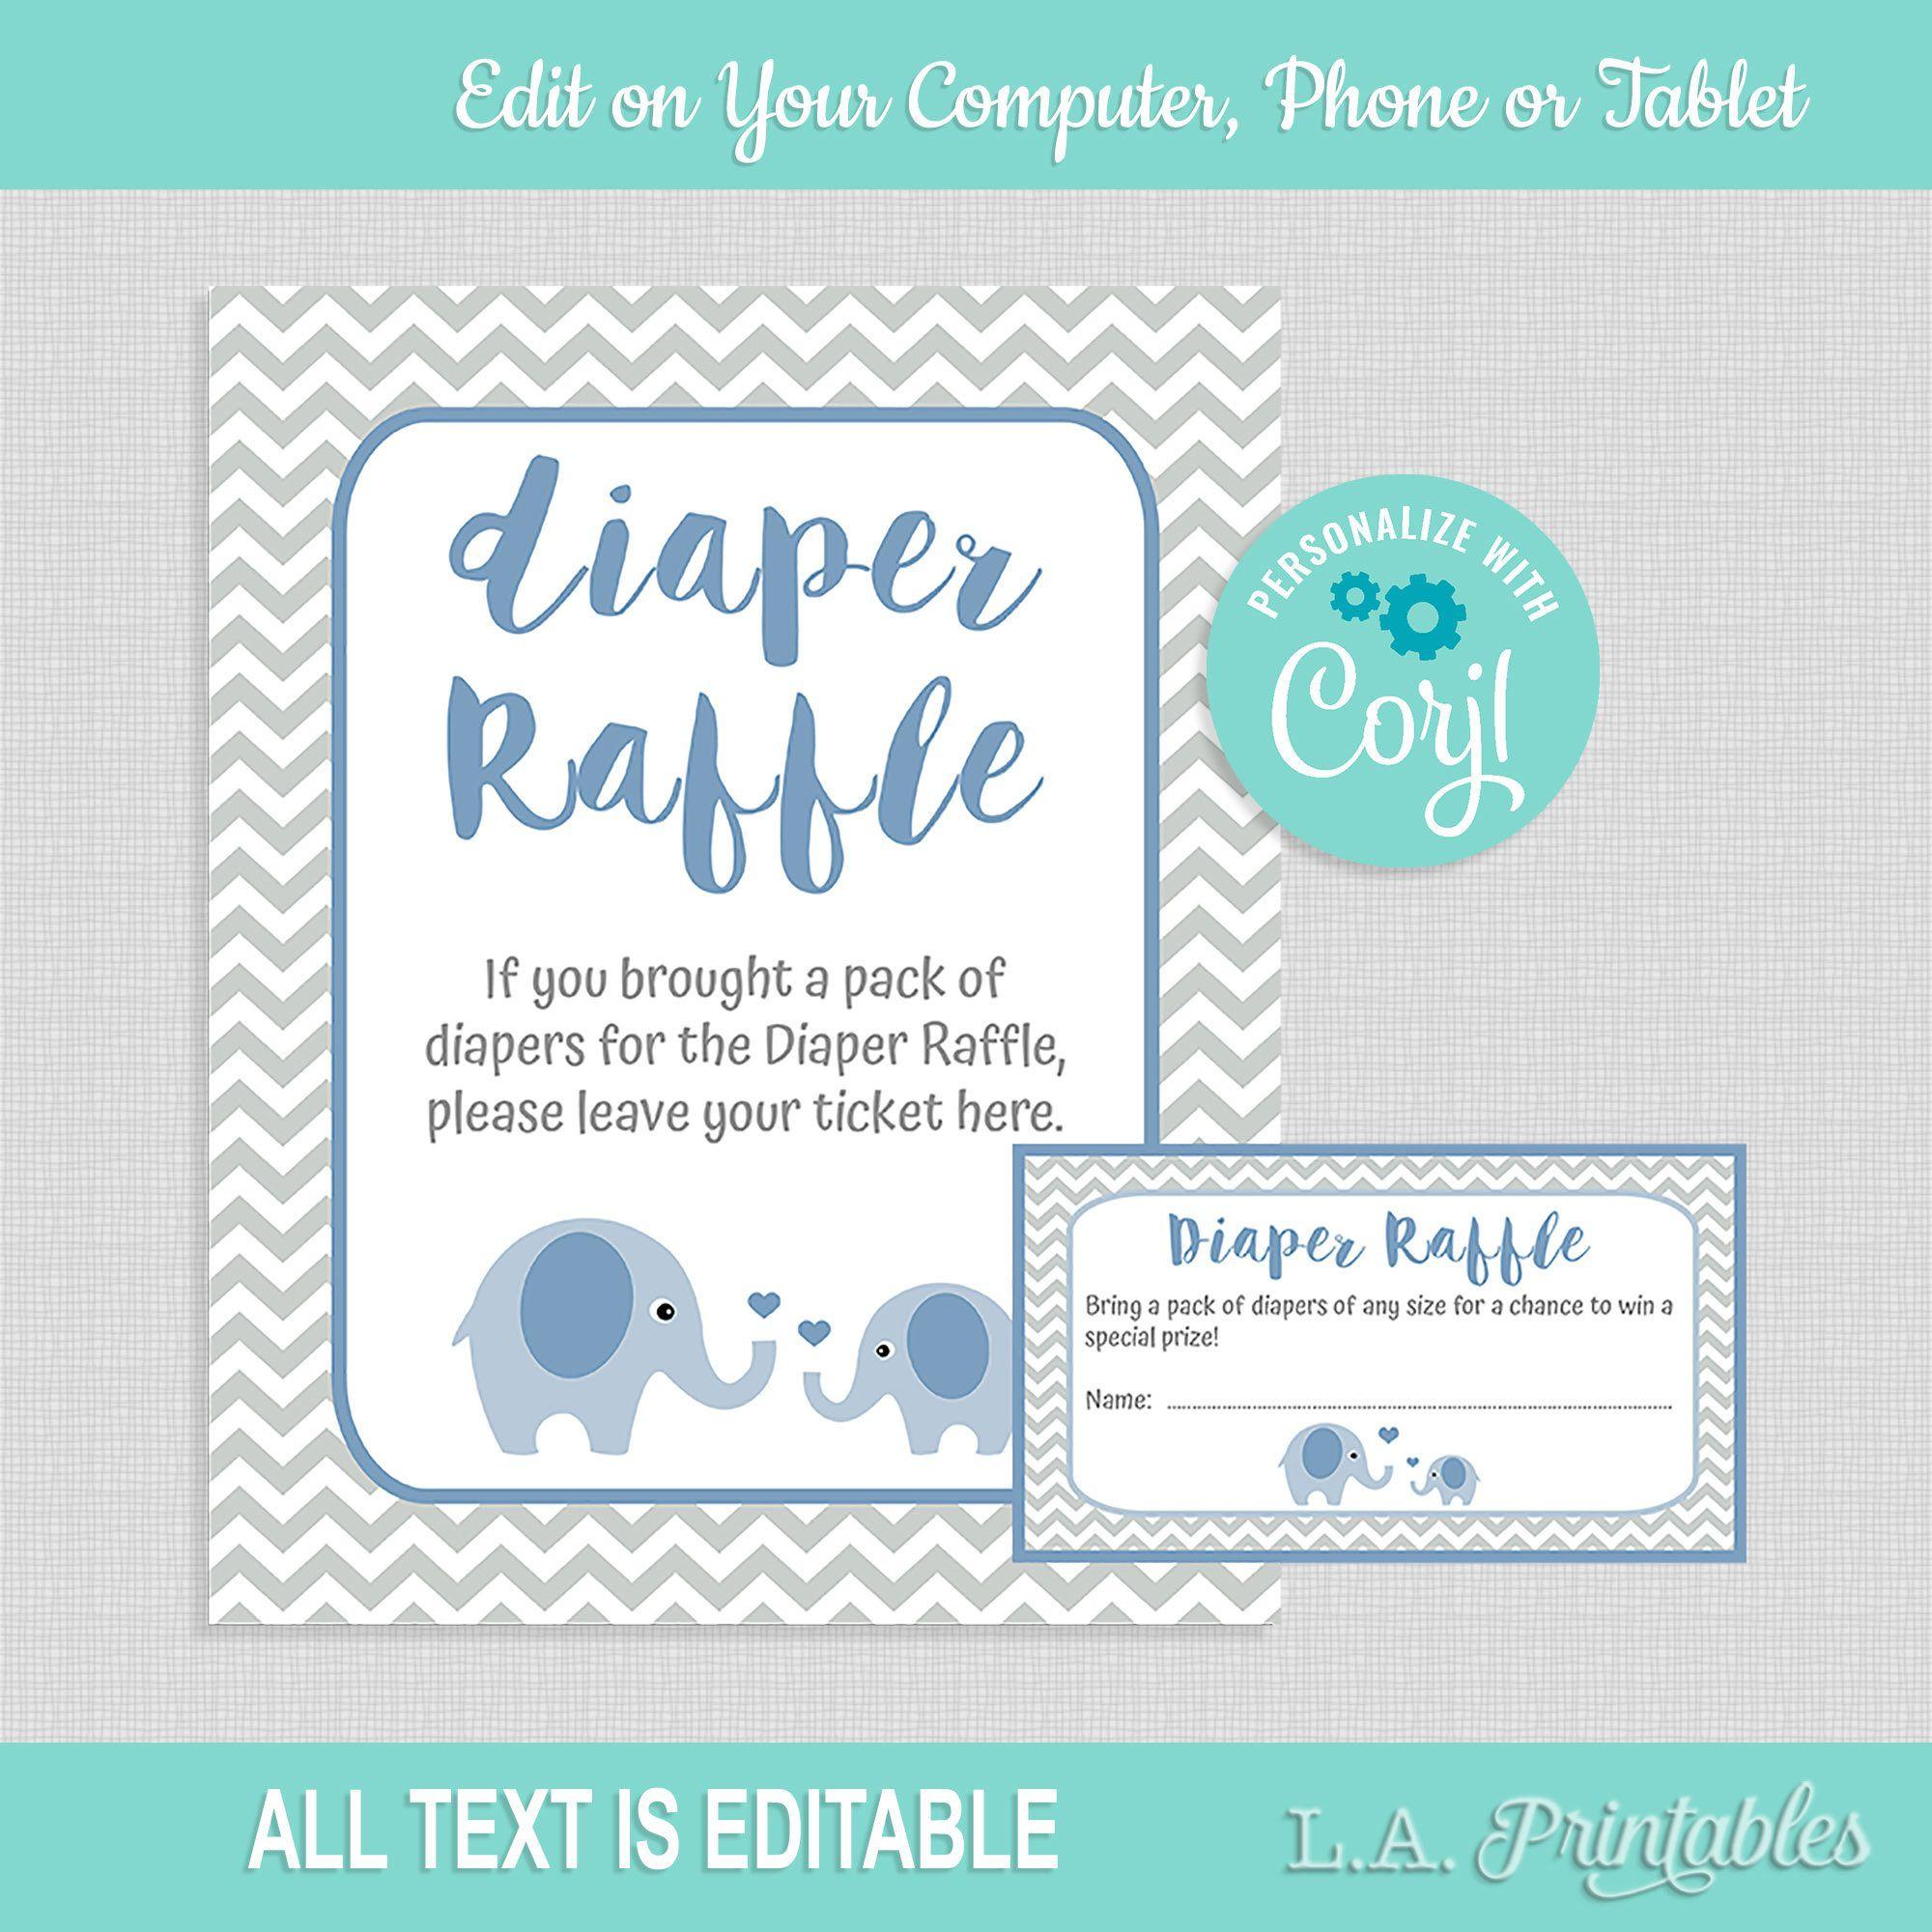 005 Singular Diaper Raffle Ticket Template High Definition  Boy Free Printable Print Black And WhiteFull